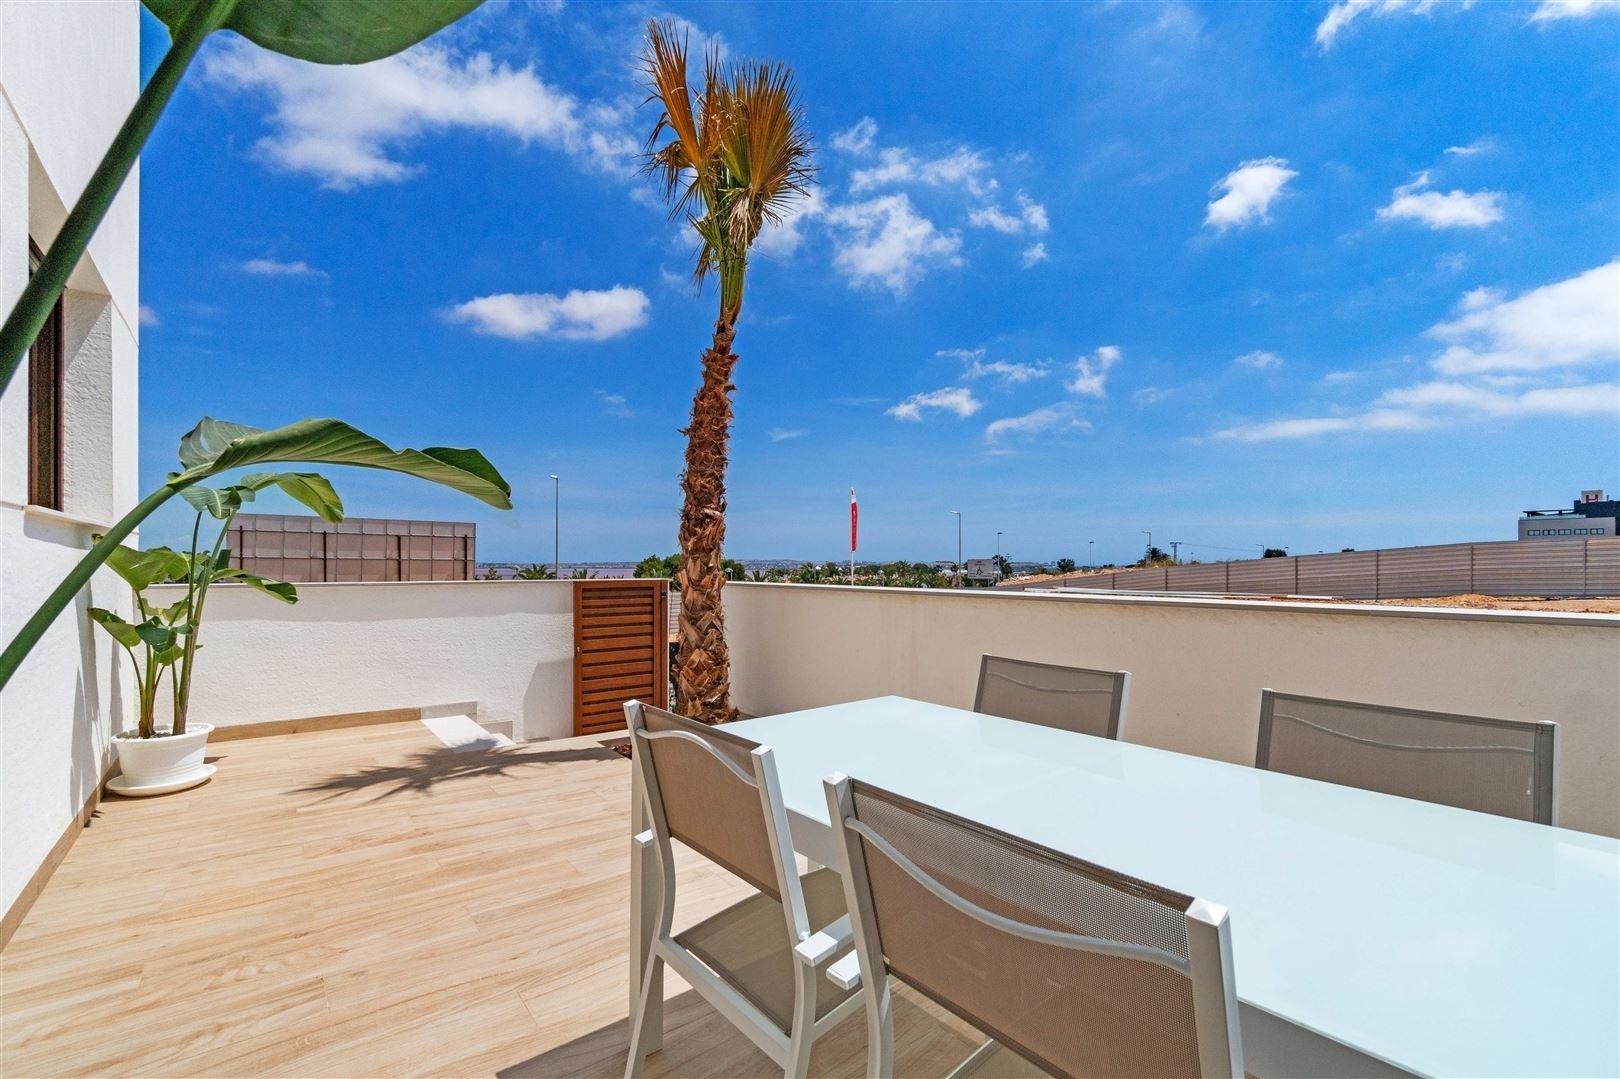 Foto 11 : Appartement te   (Spanje) - Prijs € 169.900